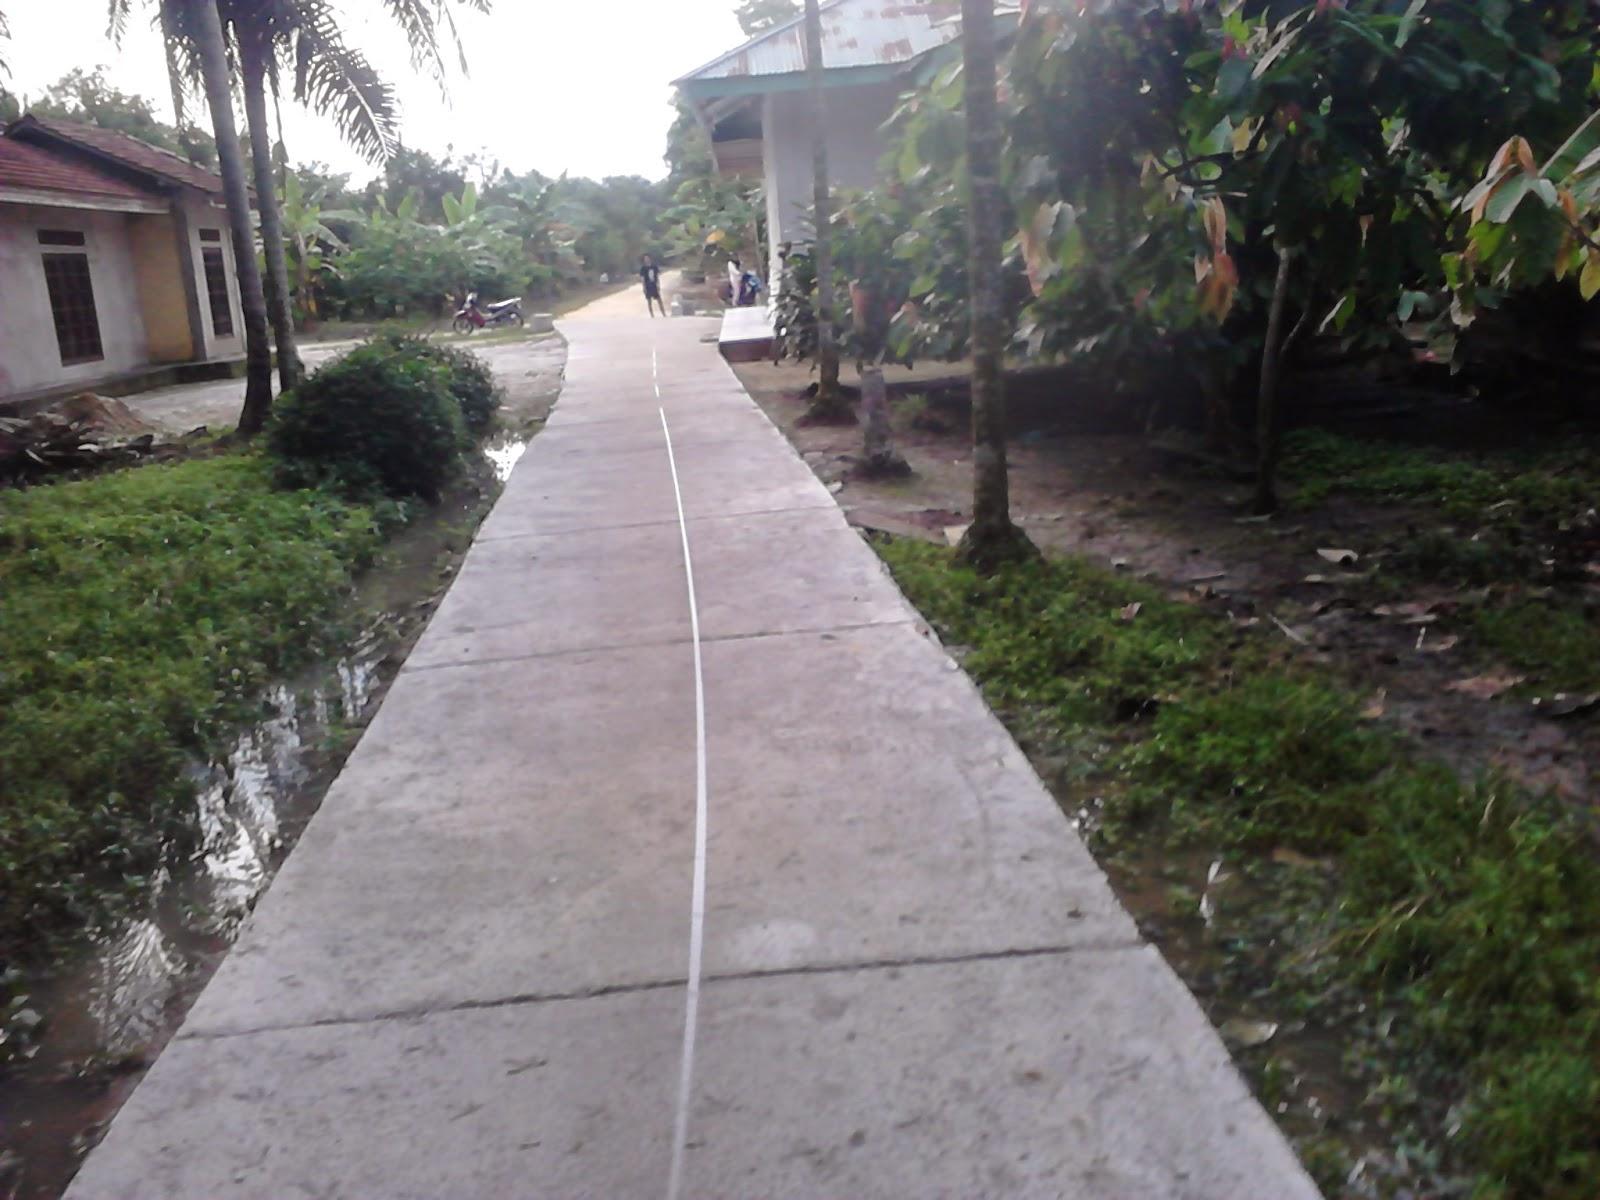 mengukur jalan yang telah disemenisasi di Desa Seresam